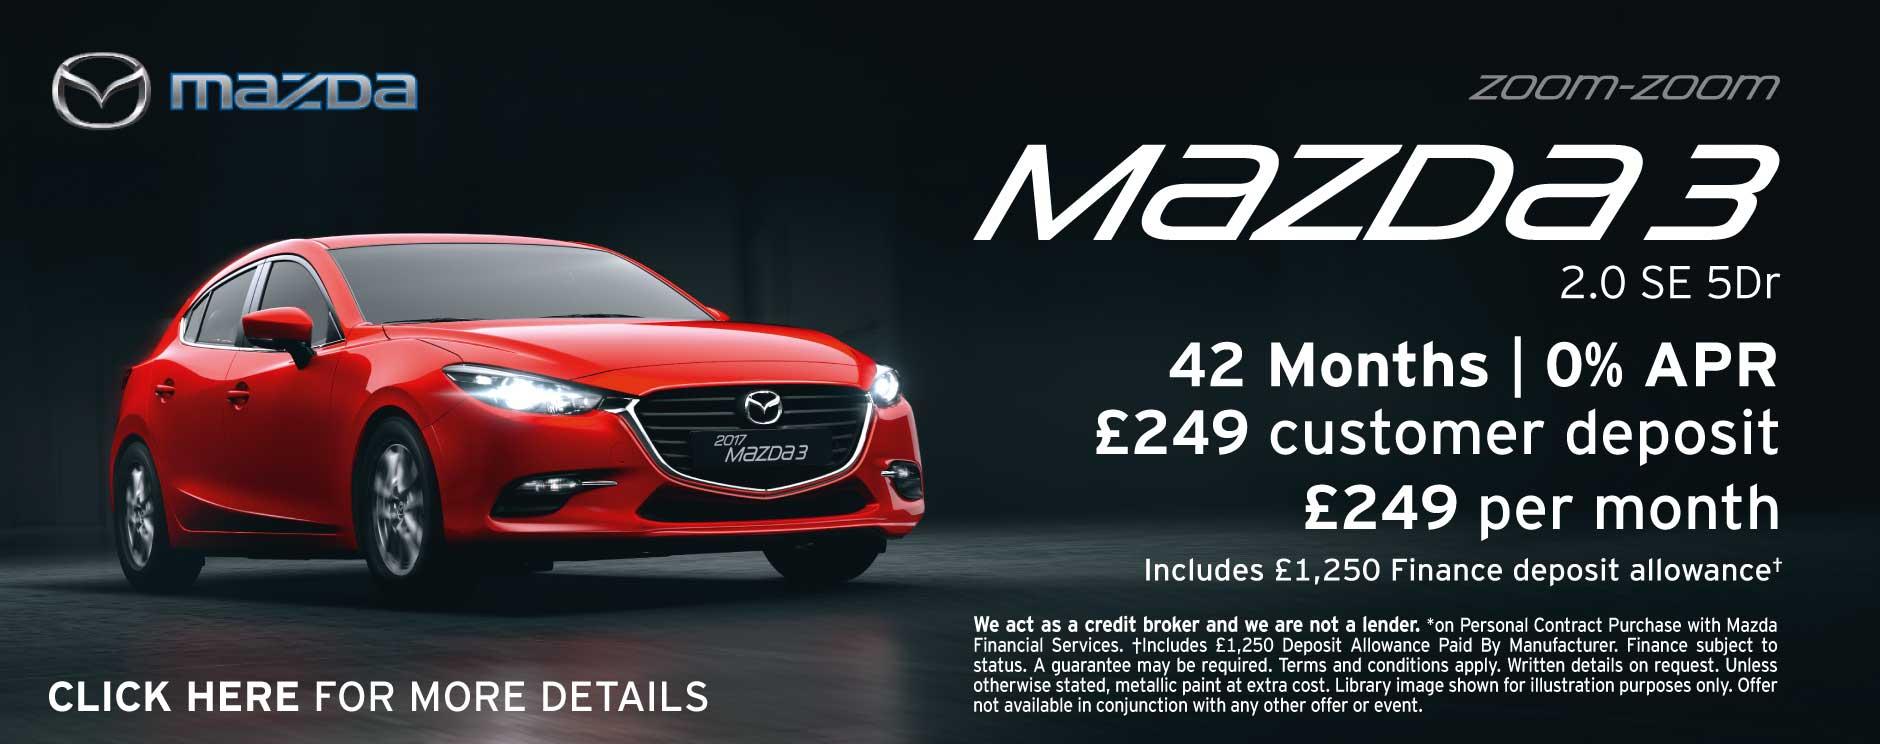 New Mazda Deals New Mazda Cars For Sale Bristol Street Motors - Mazda 0 apr